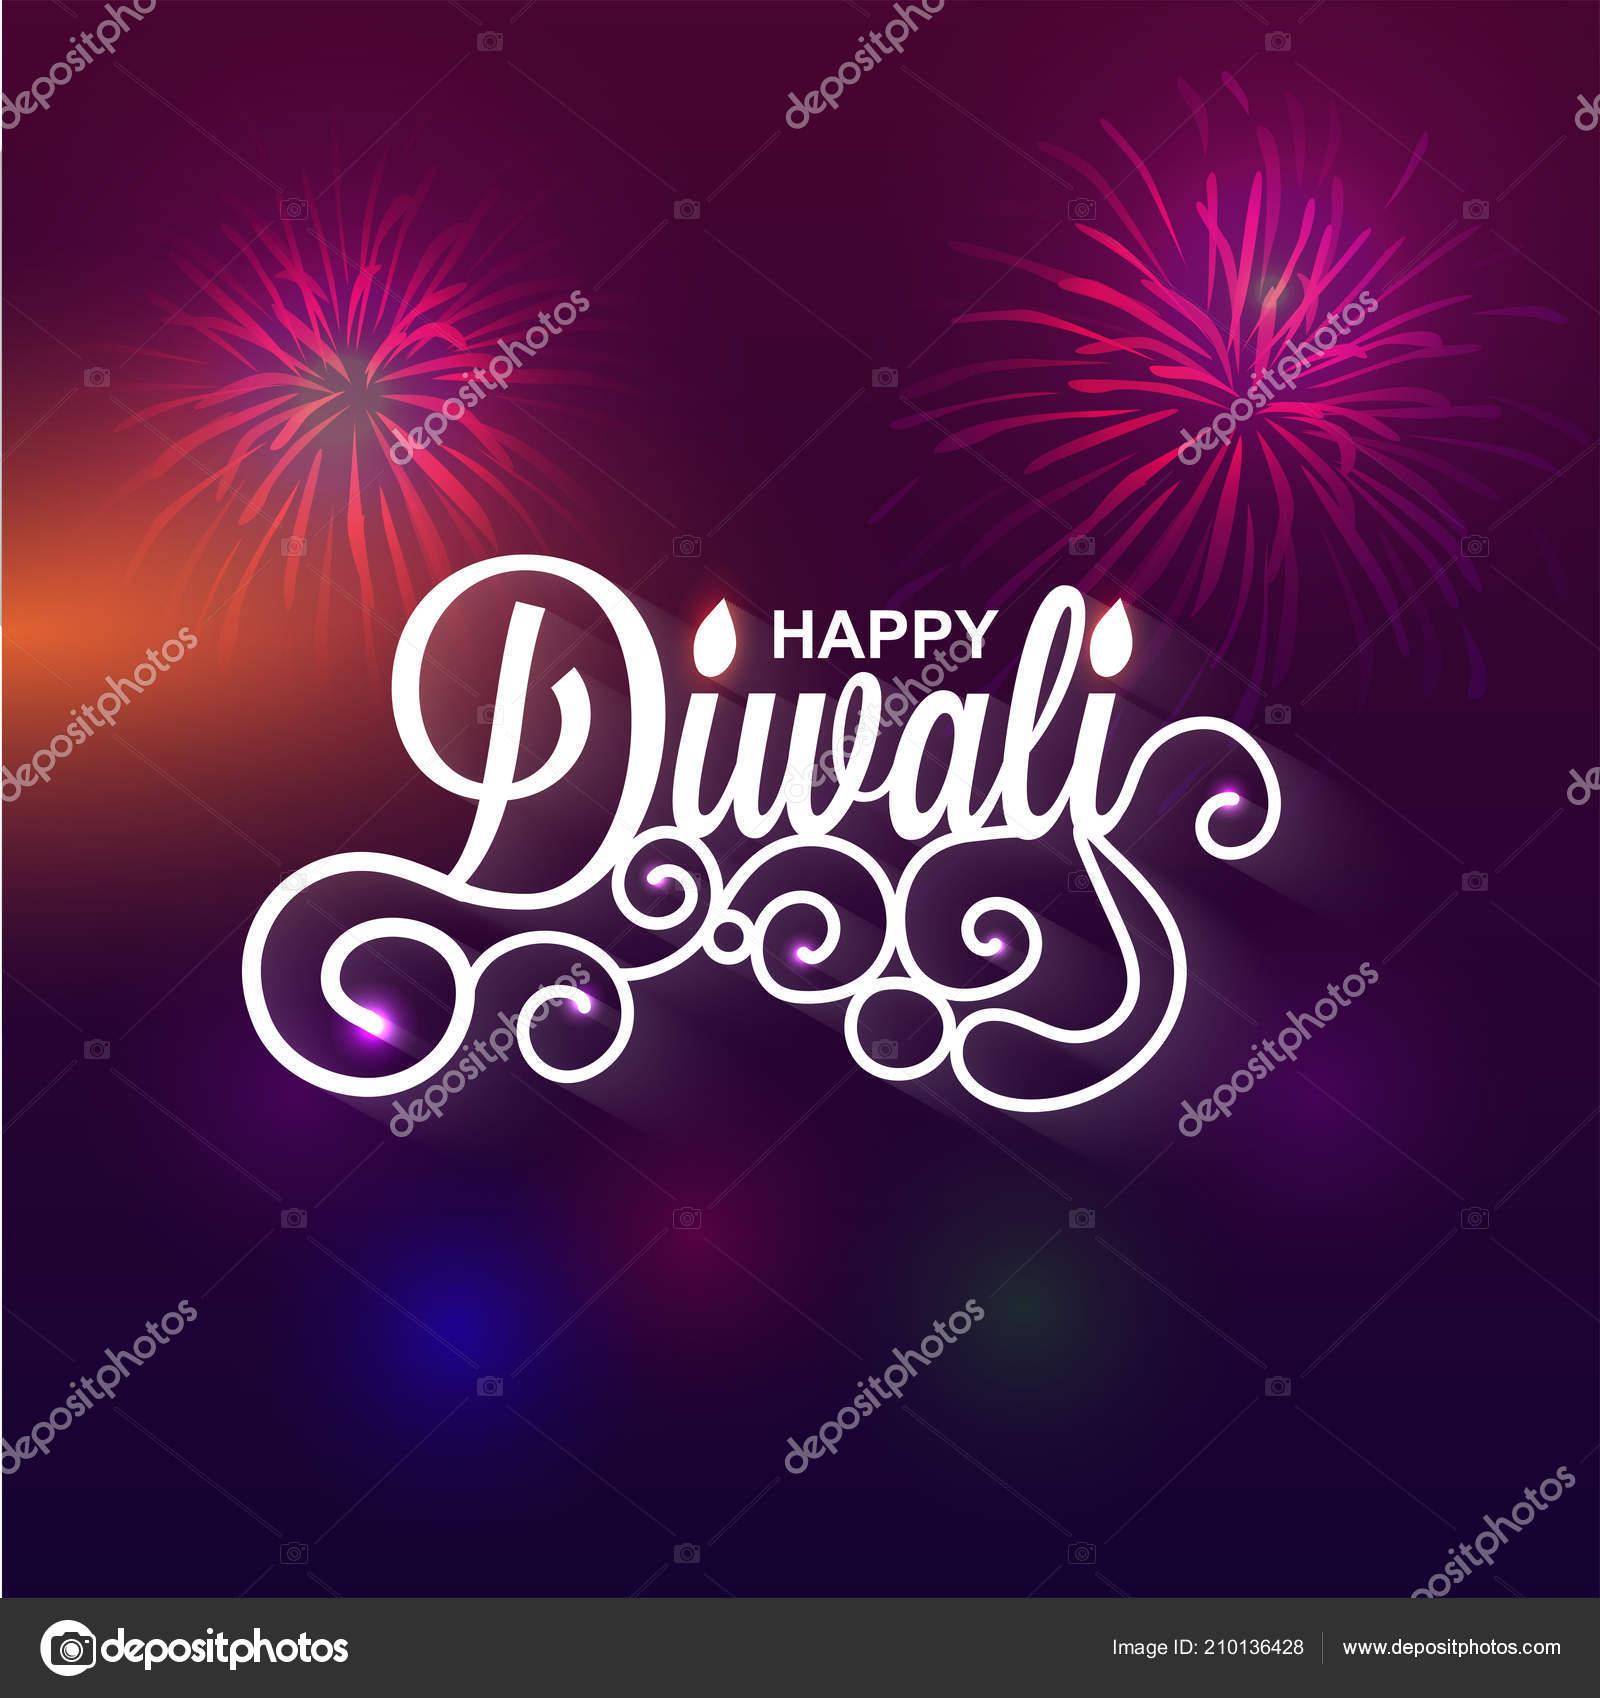 Happy diwali greeting card design creative text diwali blurred happy diwali greeting card design creative text diwali blurred firework stock vector m4hsunfo